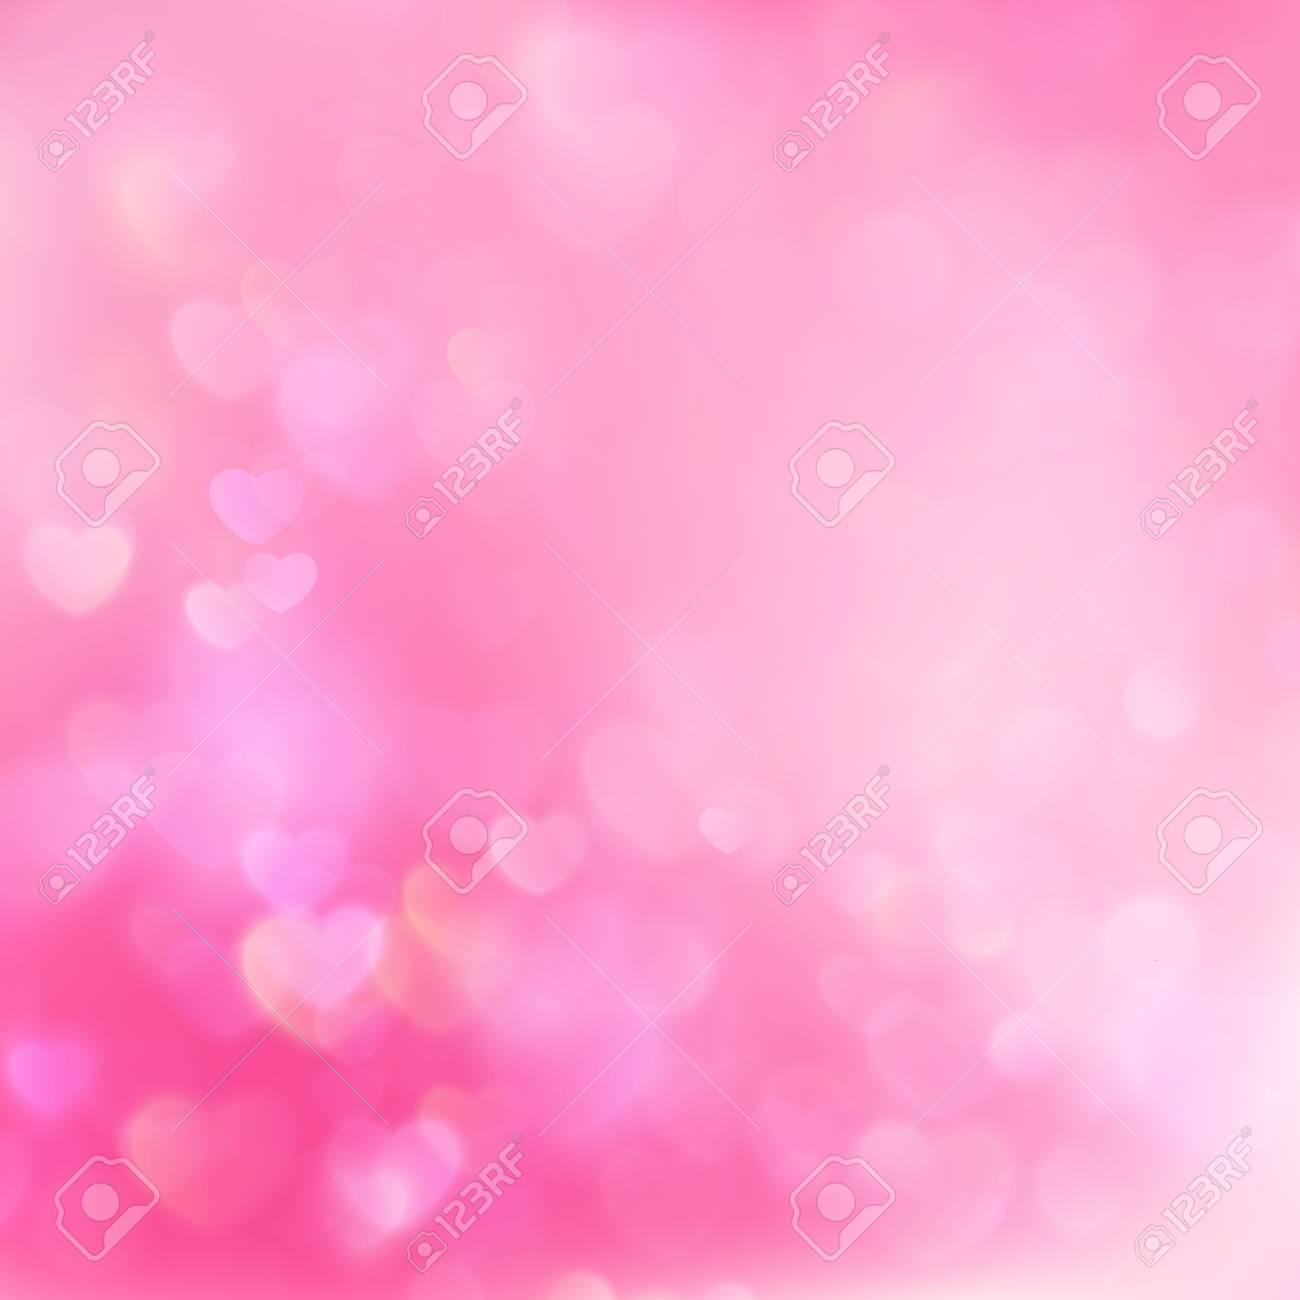 Valentine Hearts Abstract Pink Background Stvalentine S Day